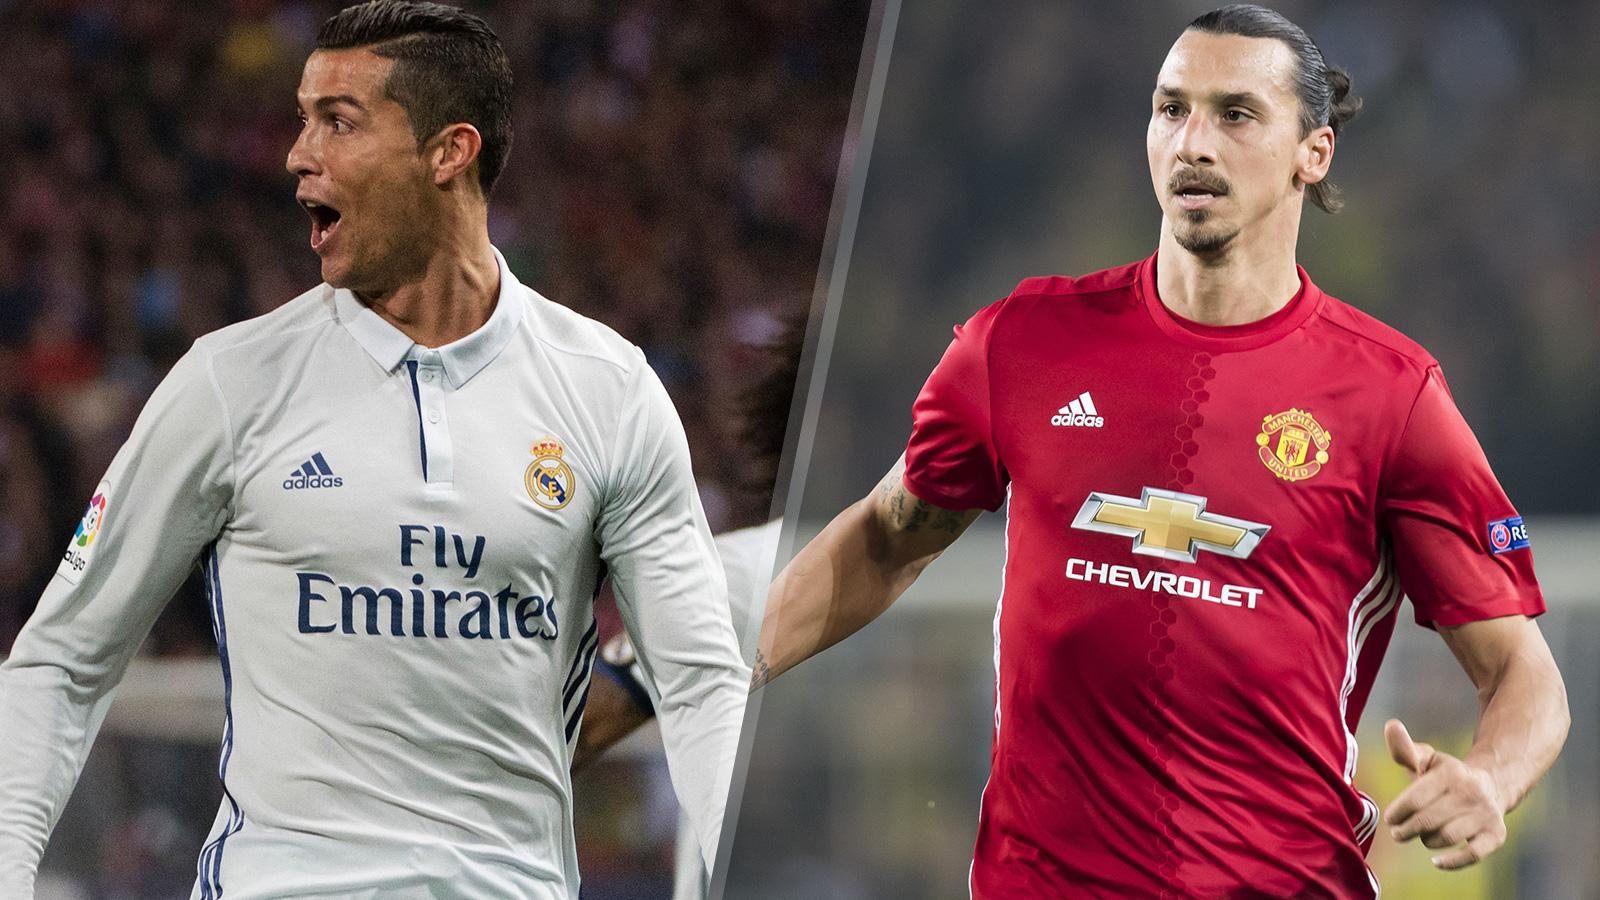 020917-Cristiano-Ronaldo-Zlatan-Ibrahimovic-split